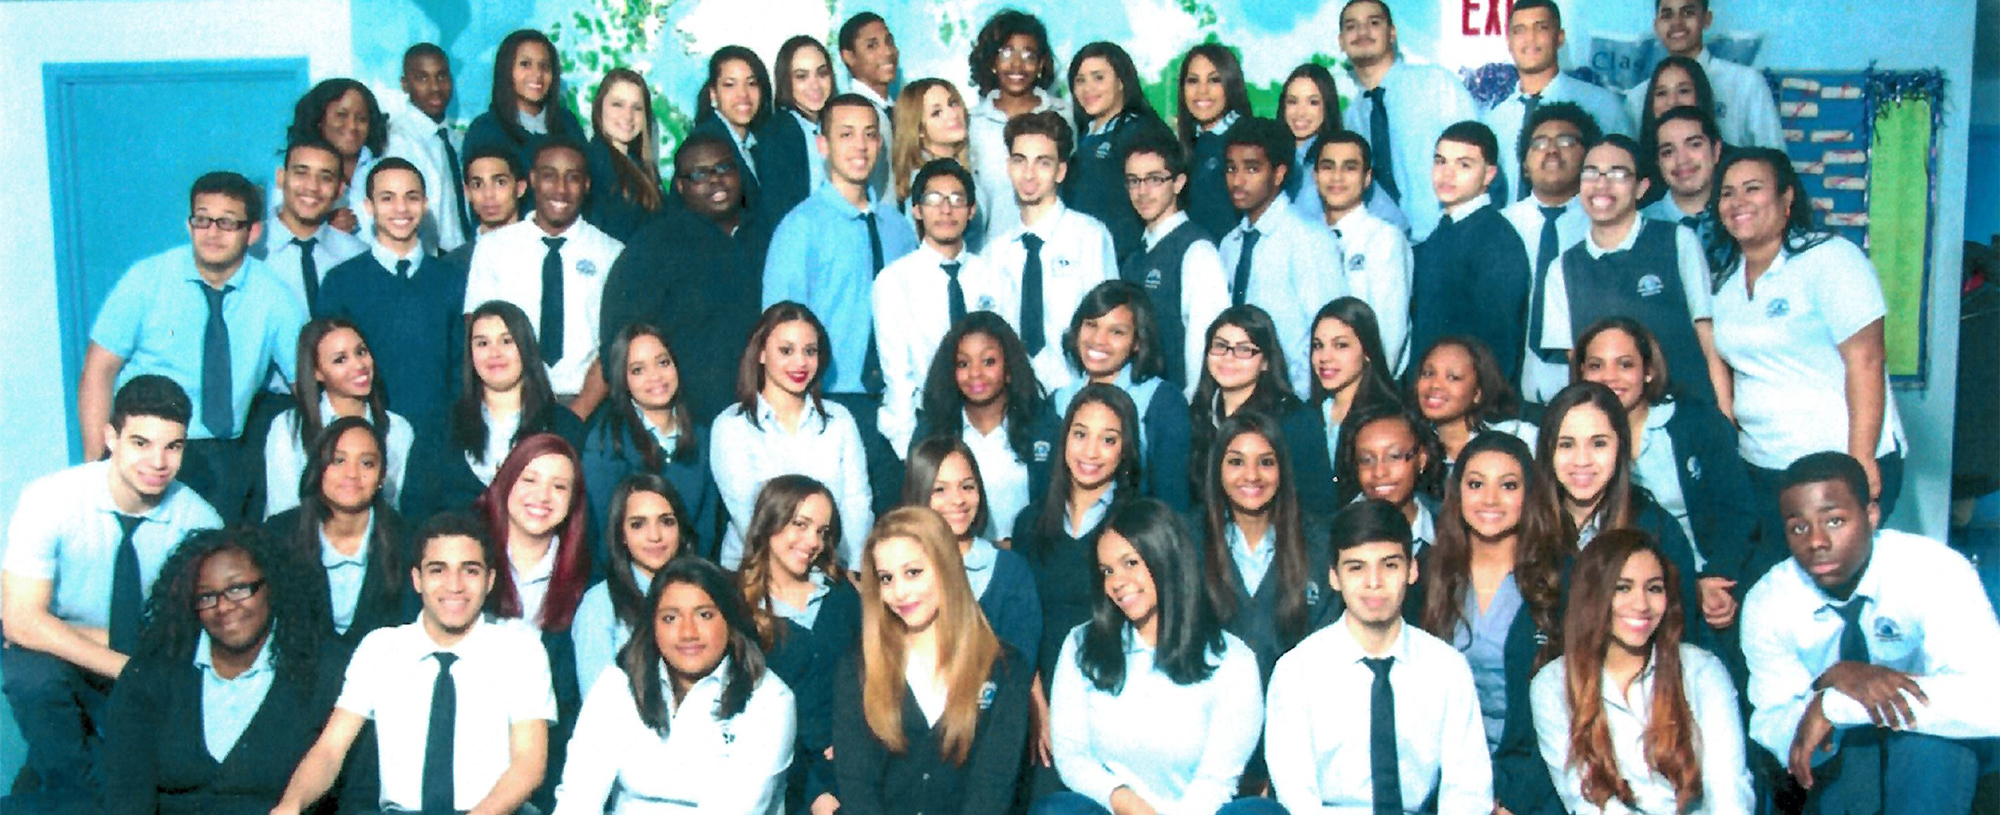 Photo of International Leadership Charter High School class of 2014